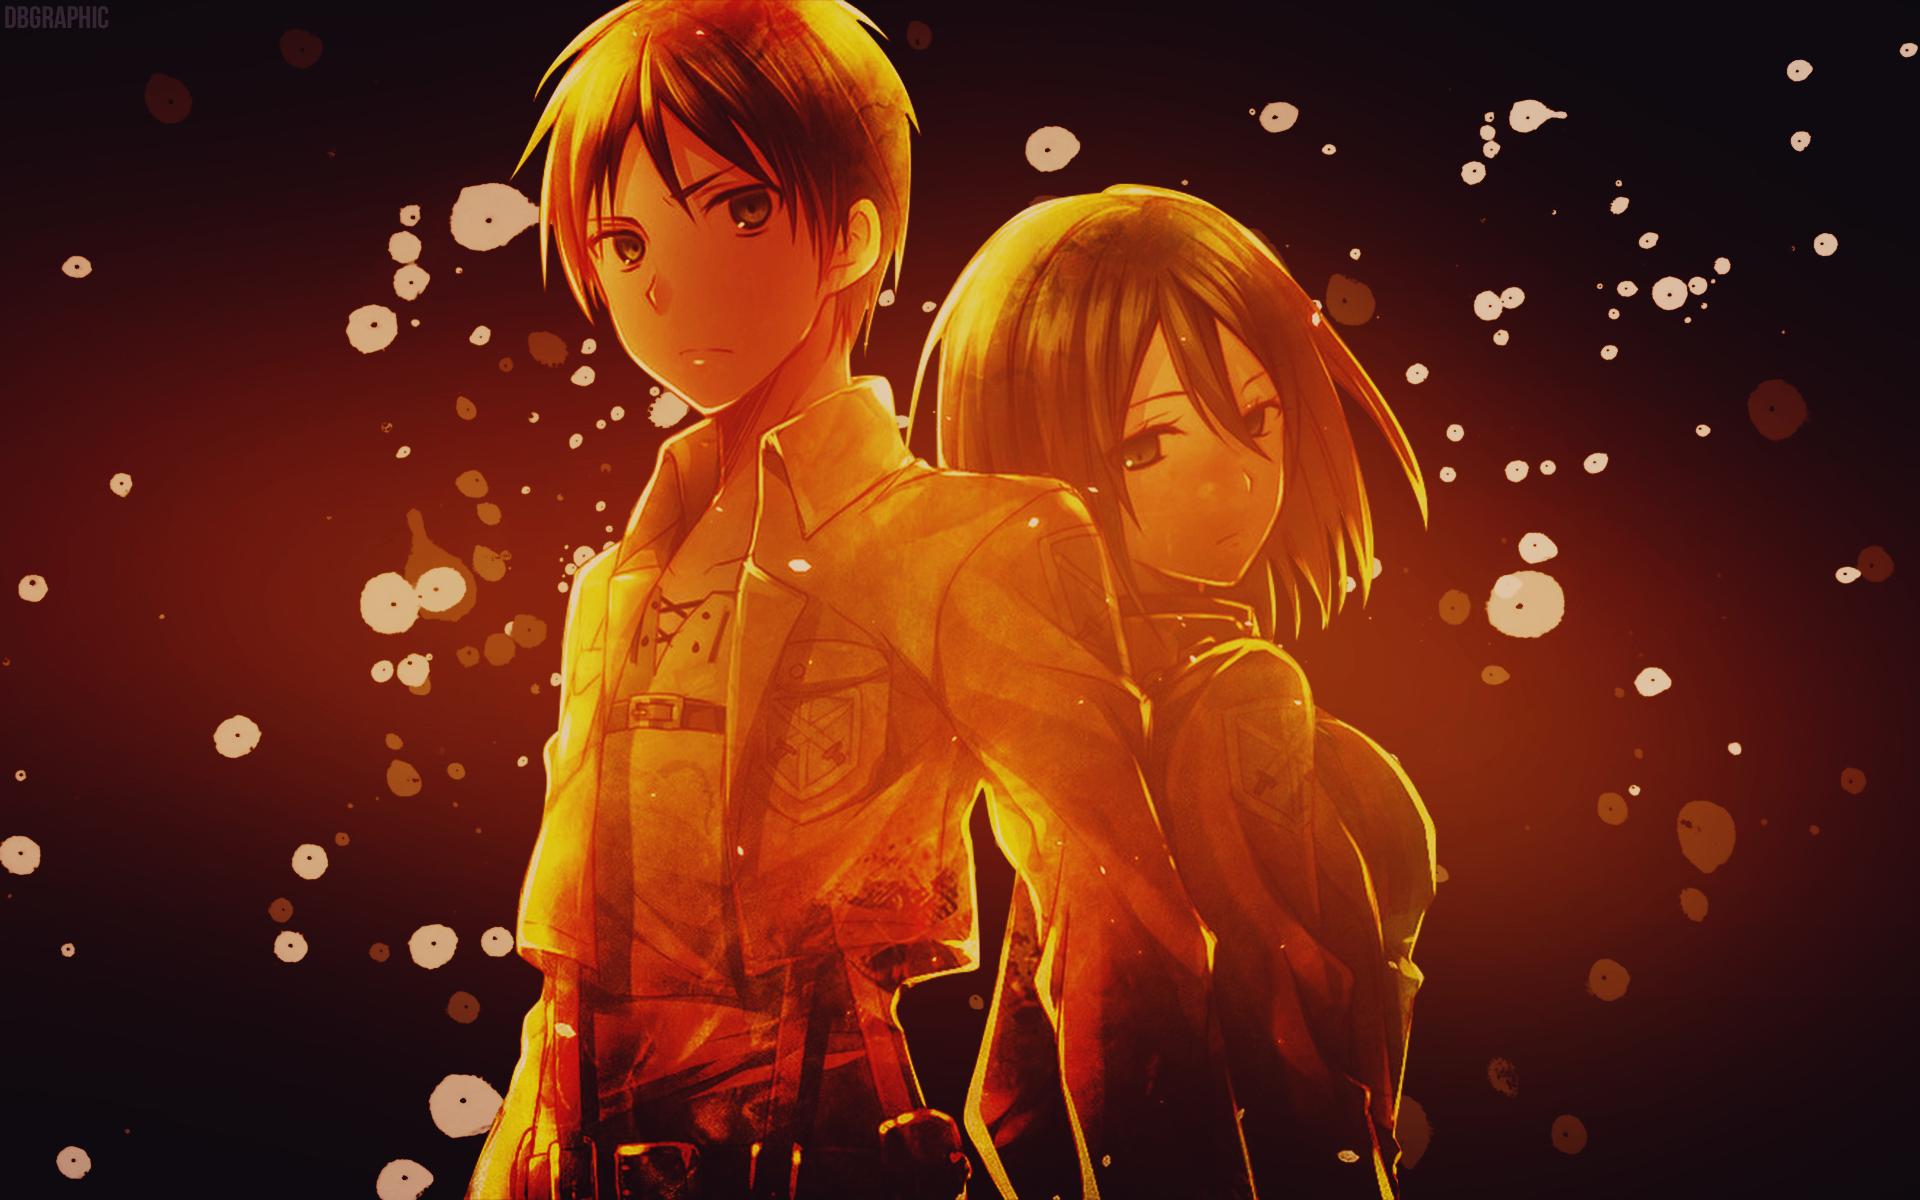 Shingeki No Kyojin Mikasa x Eren Wallpaper by DeathB00K